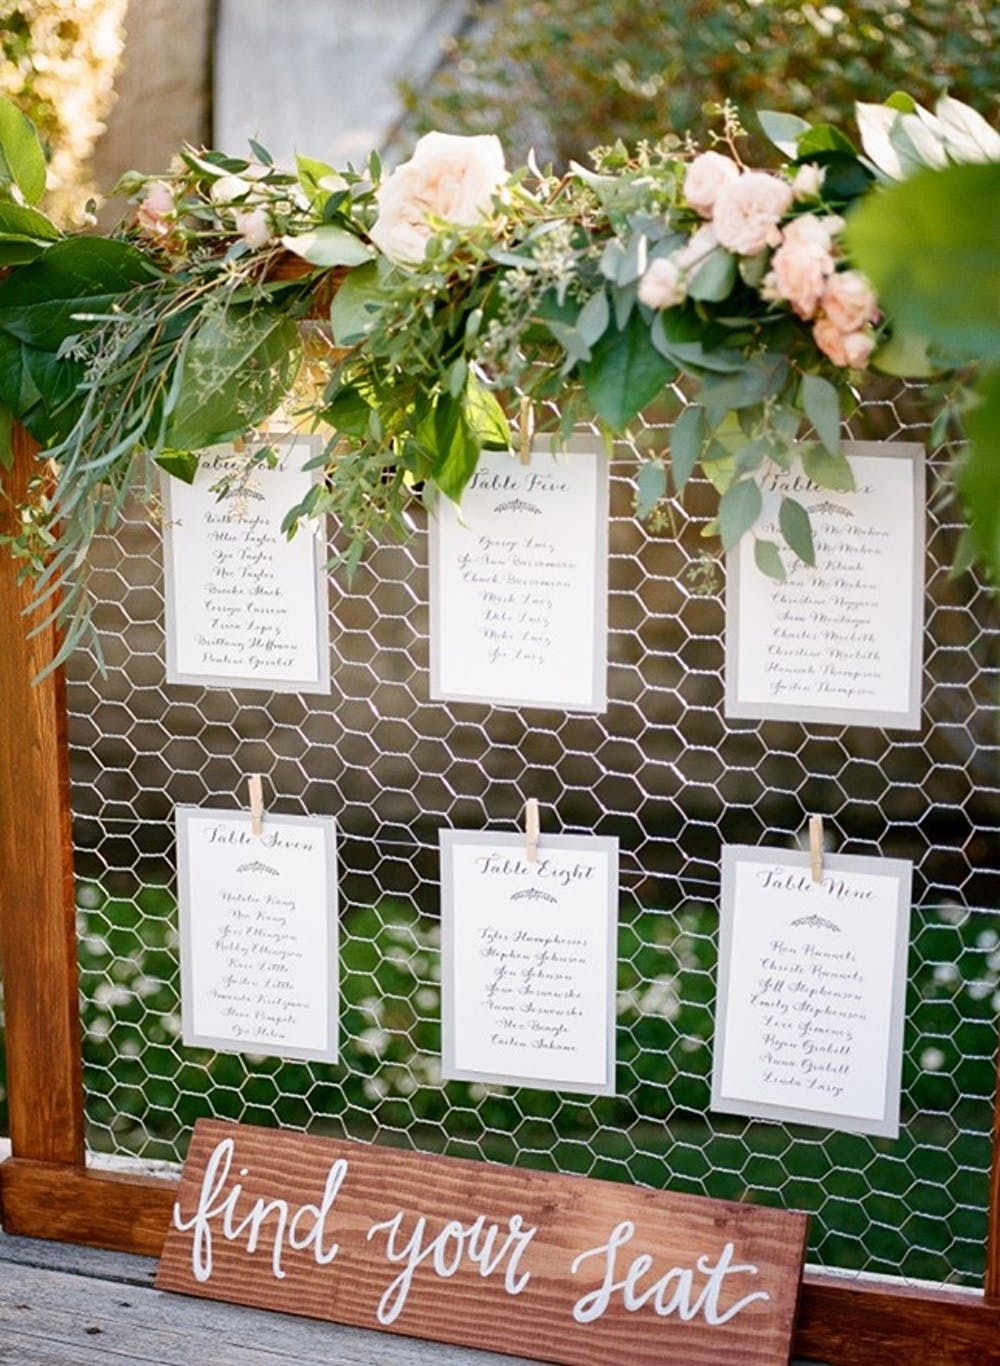 10 Backyard Wedding Decor Ideas For The Most Insta Worthy Nuptials Ever Brit Co